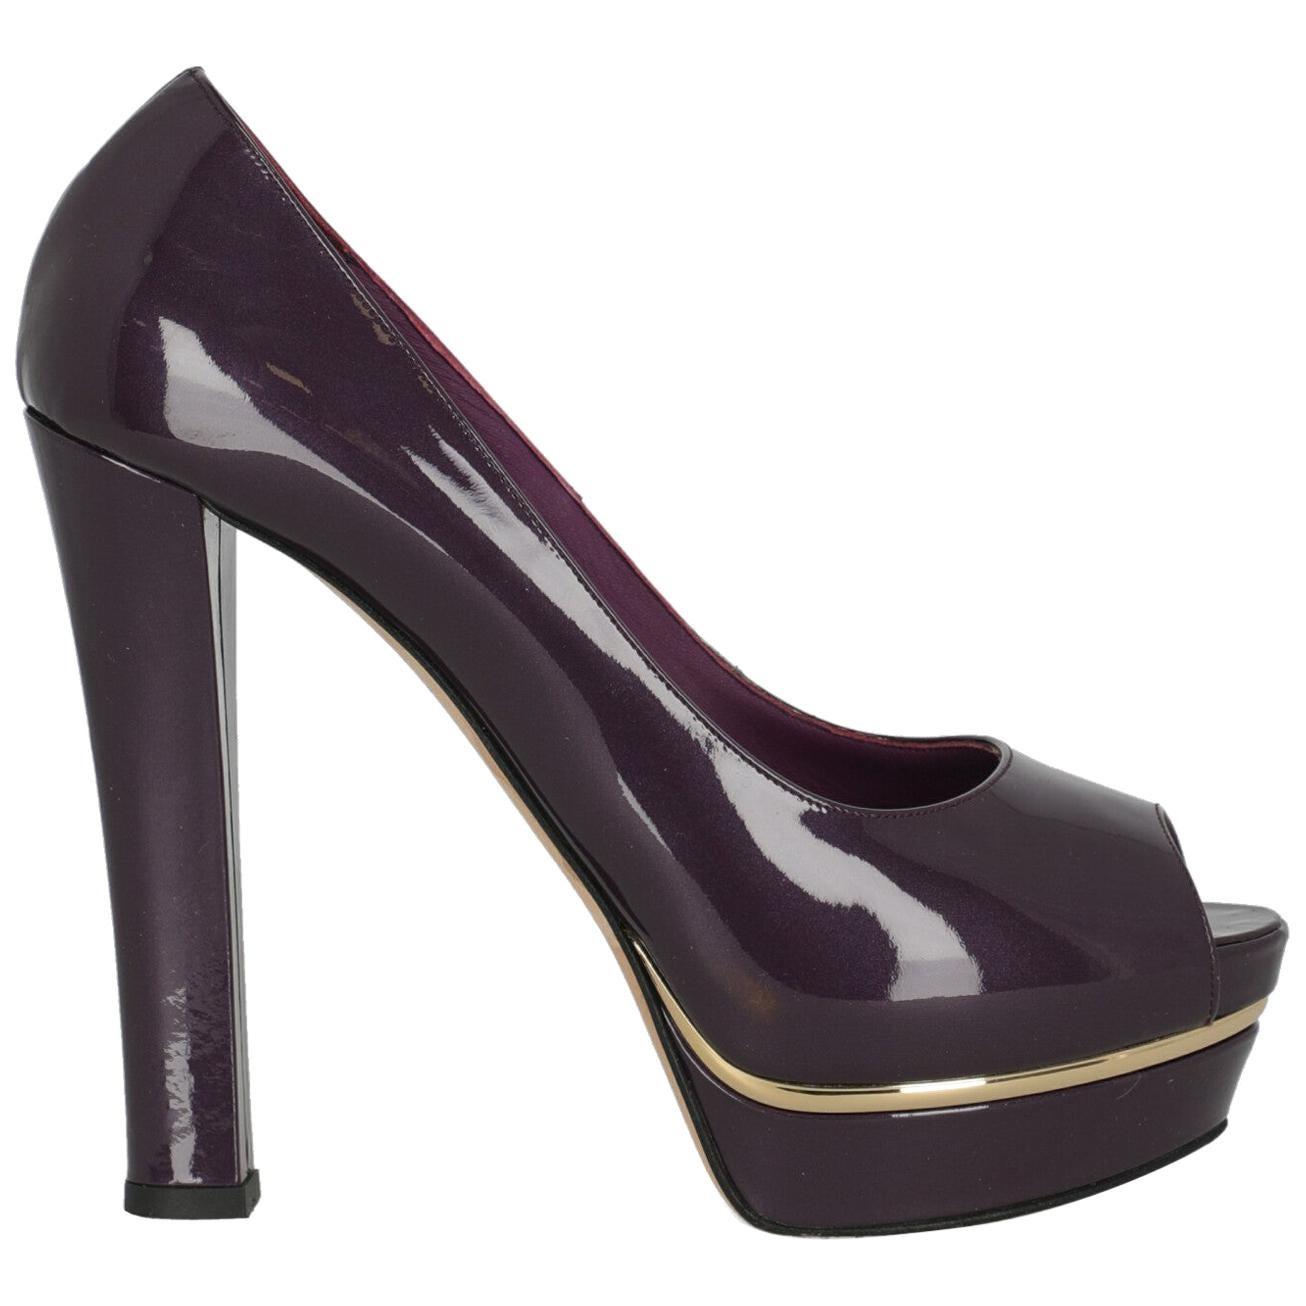 Le Silla Woman Pumps Purple Leather IT 39